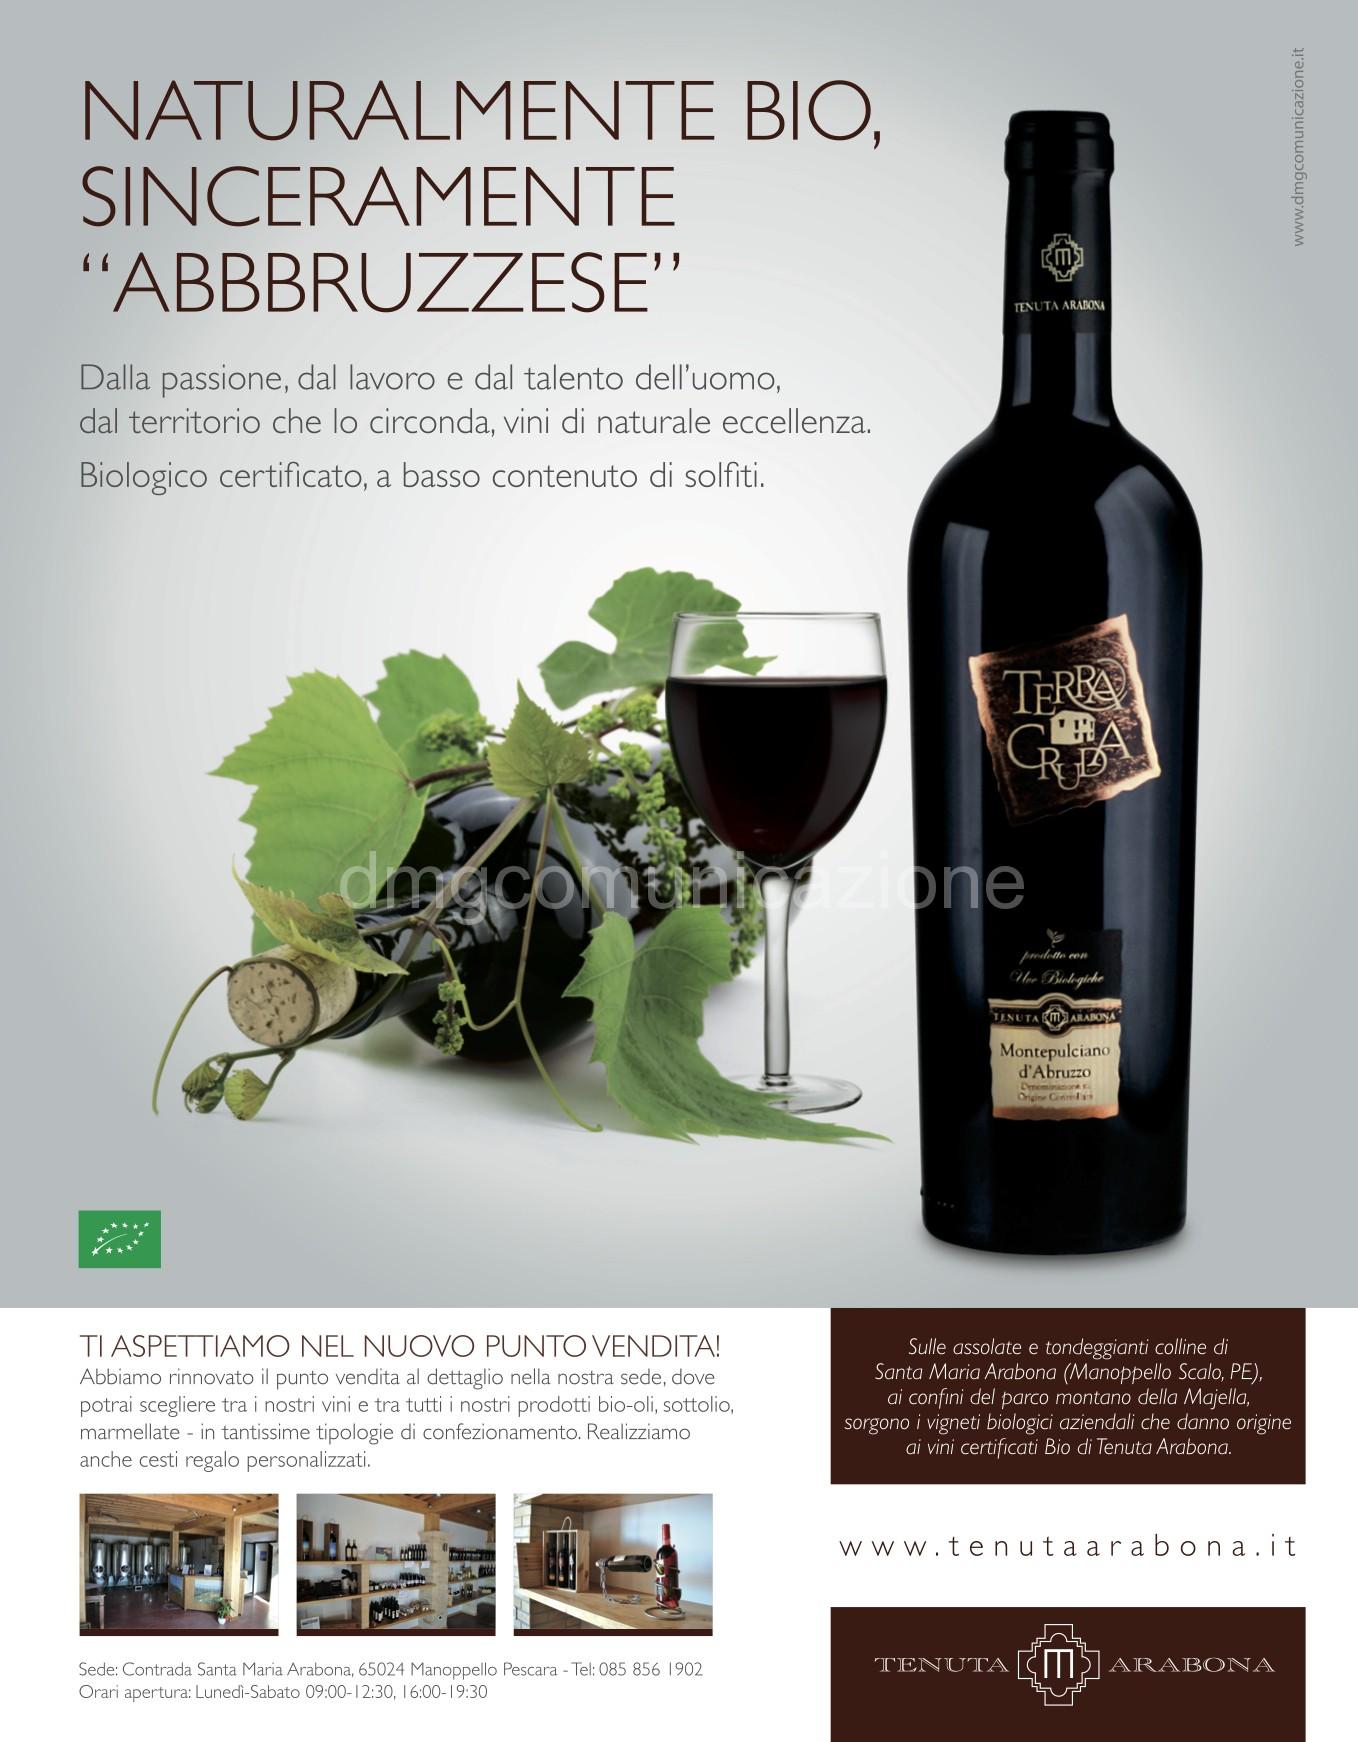 TenutaArabona_AbruzzoMagazine220x285_11.13_OK_TRK